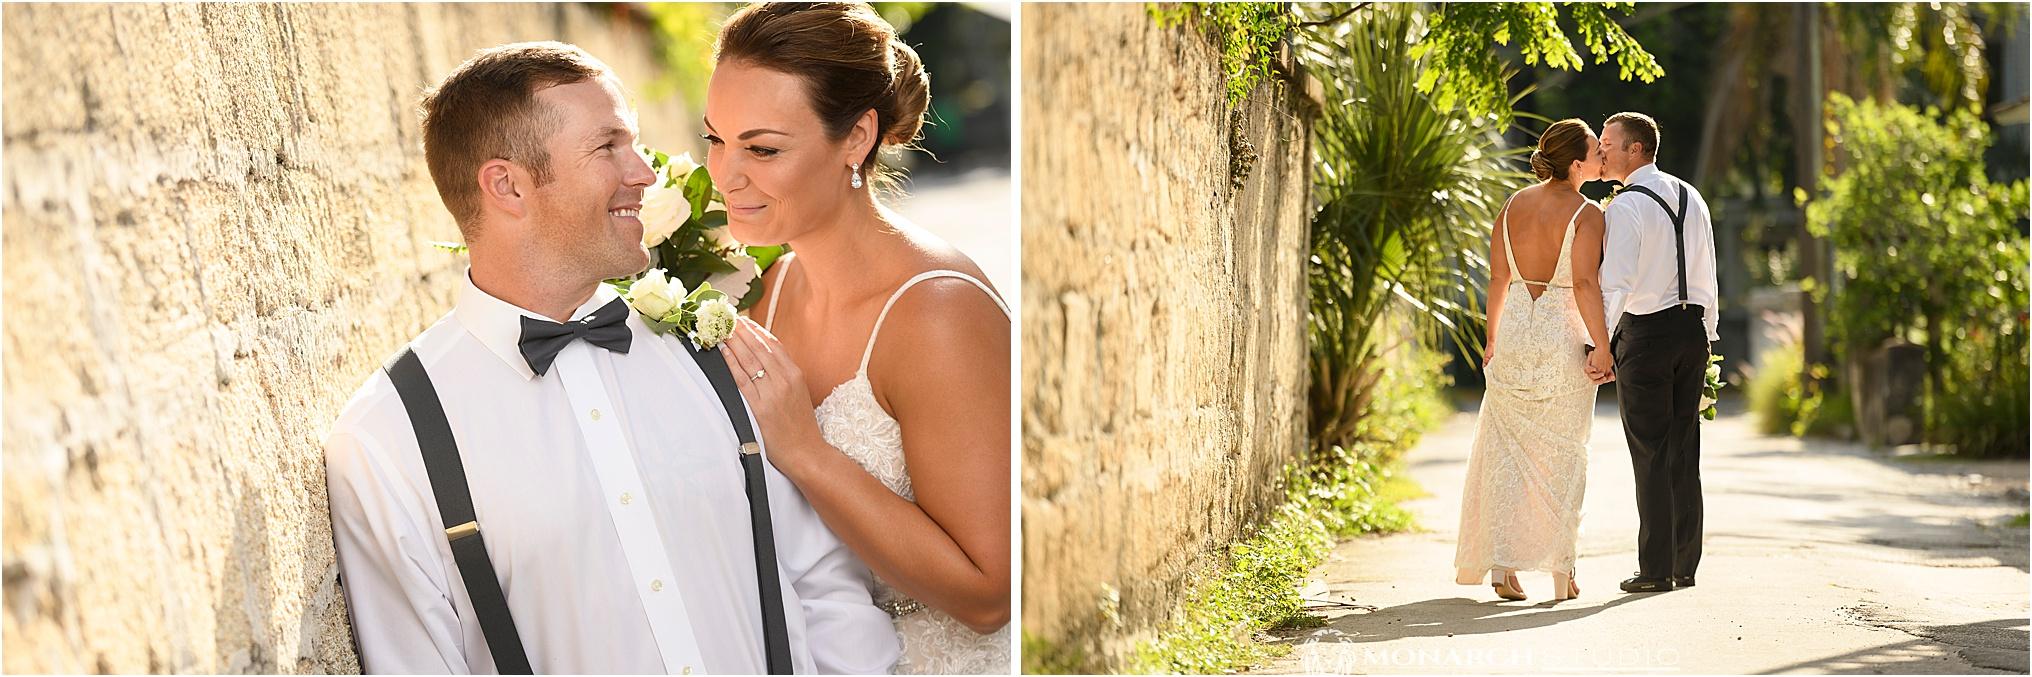 051-whiteroom-wedding-photographer-2019-05-22_0033.jpg